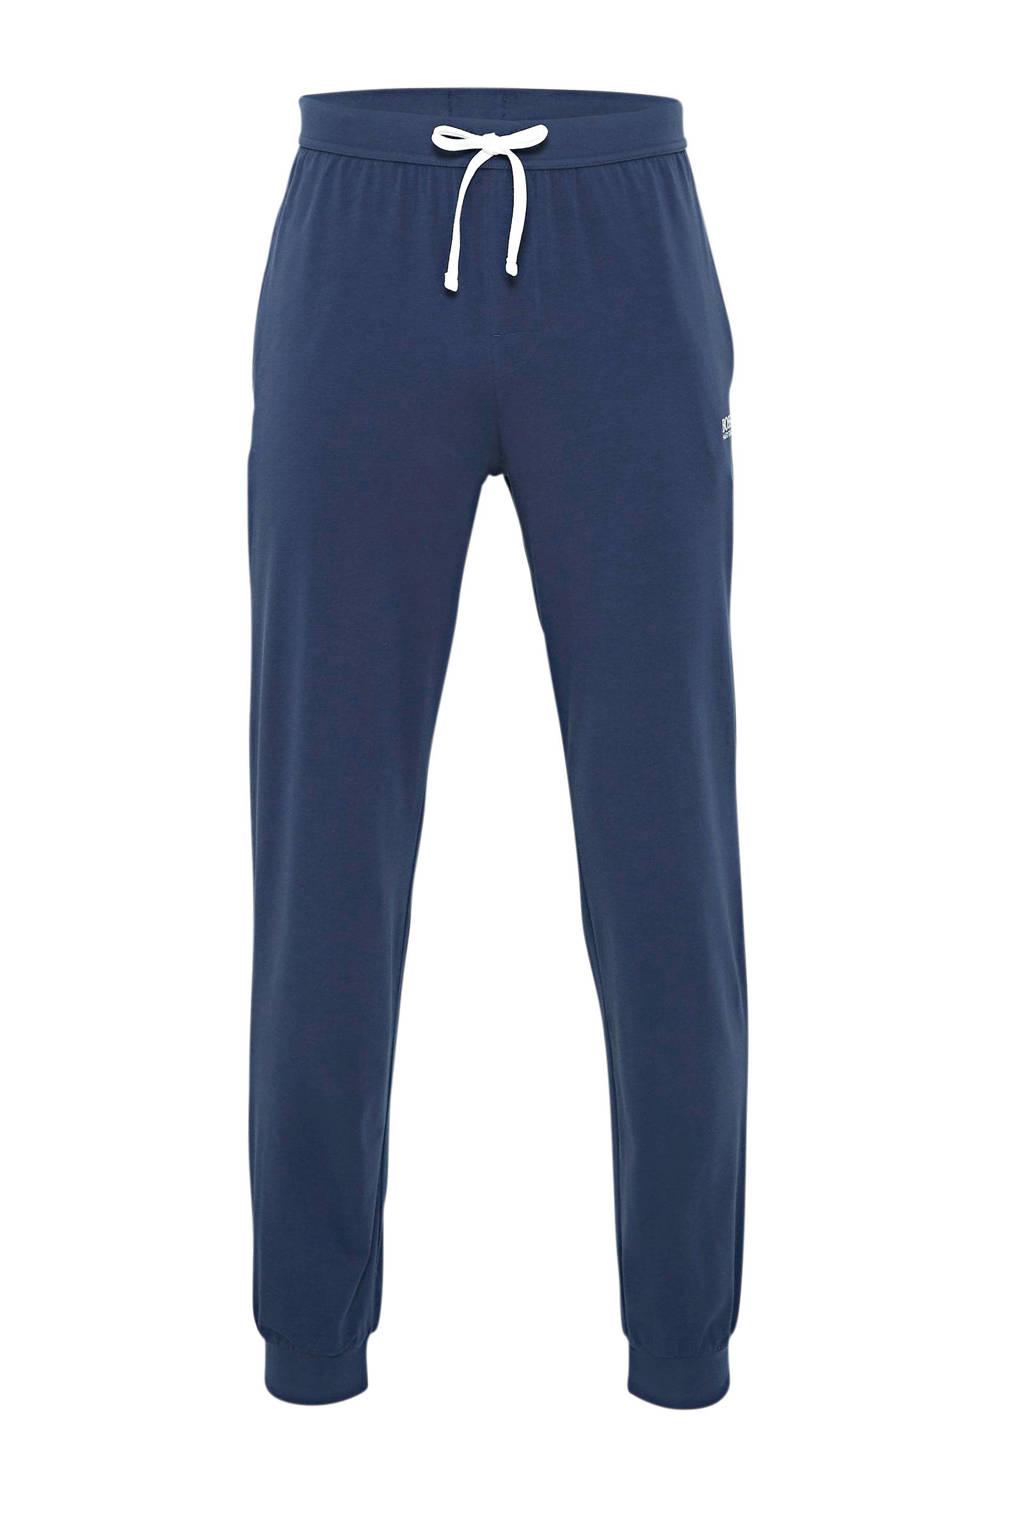 BOSS Bodywear joggingbroek donkerblauw, Donkerblauw